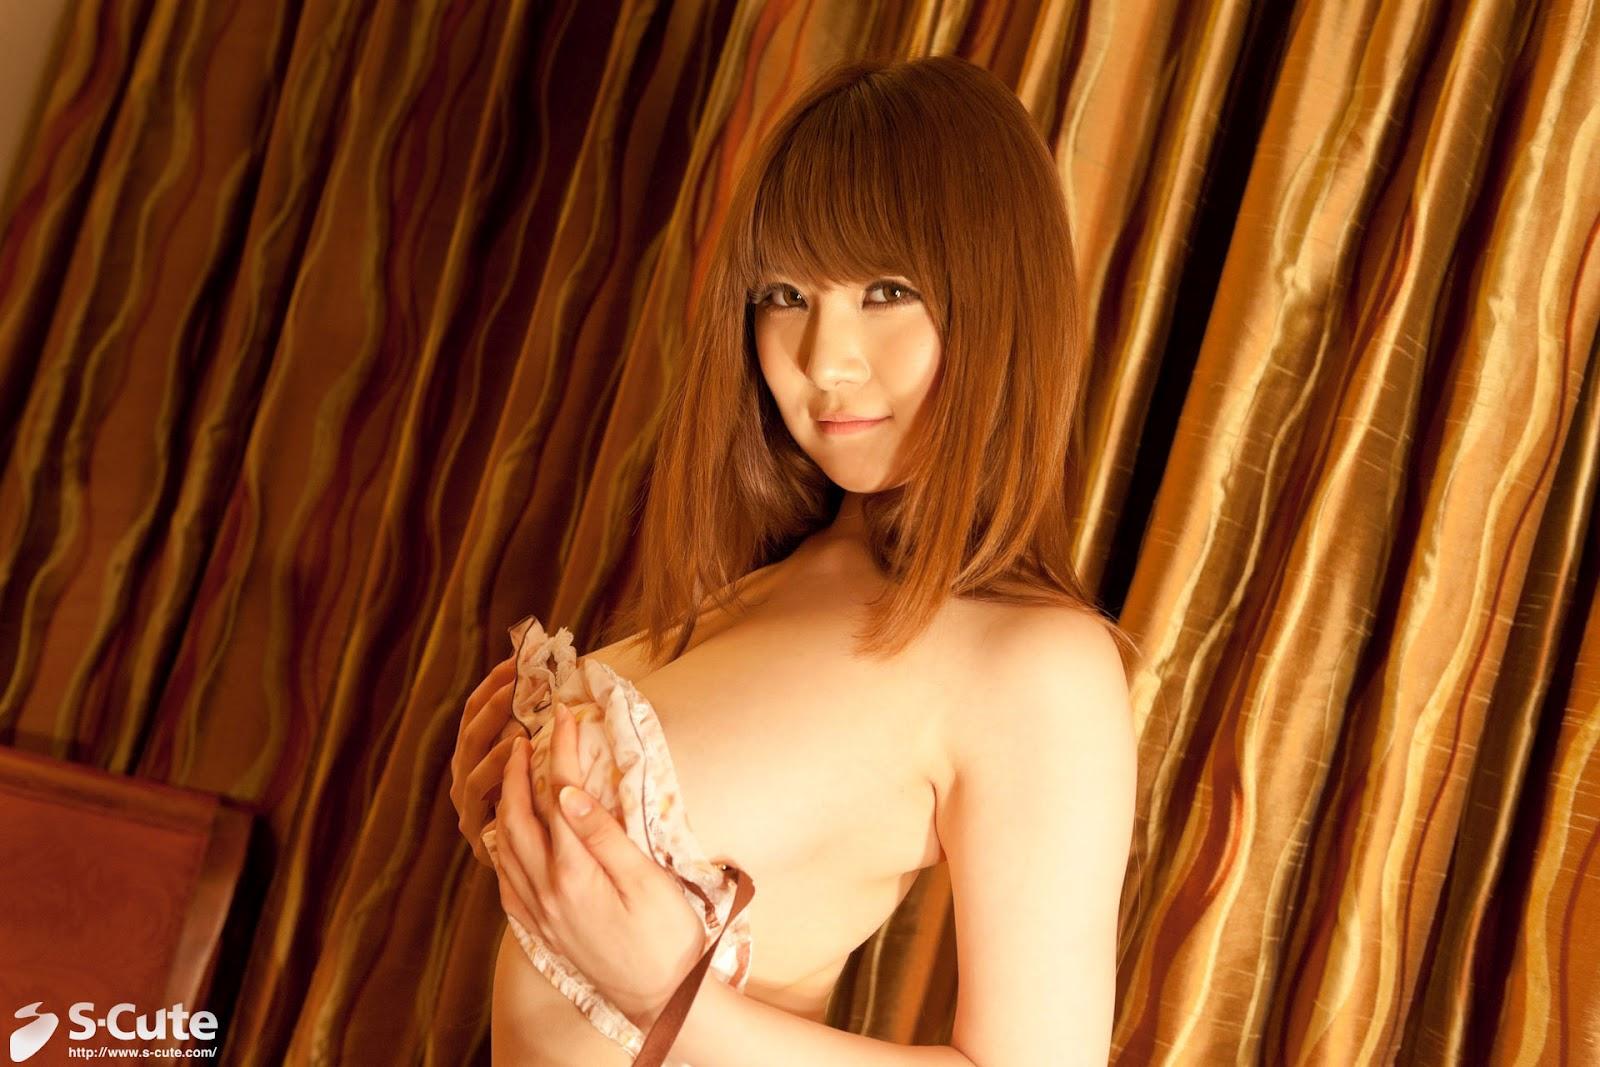 S-Cute Momoka Nishina